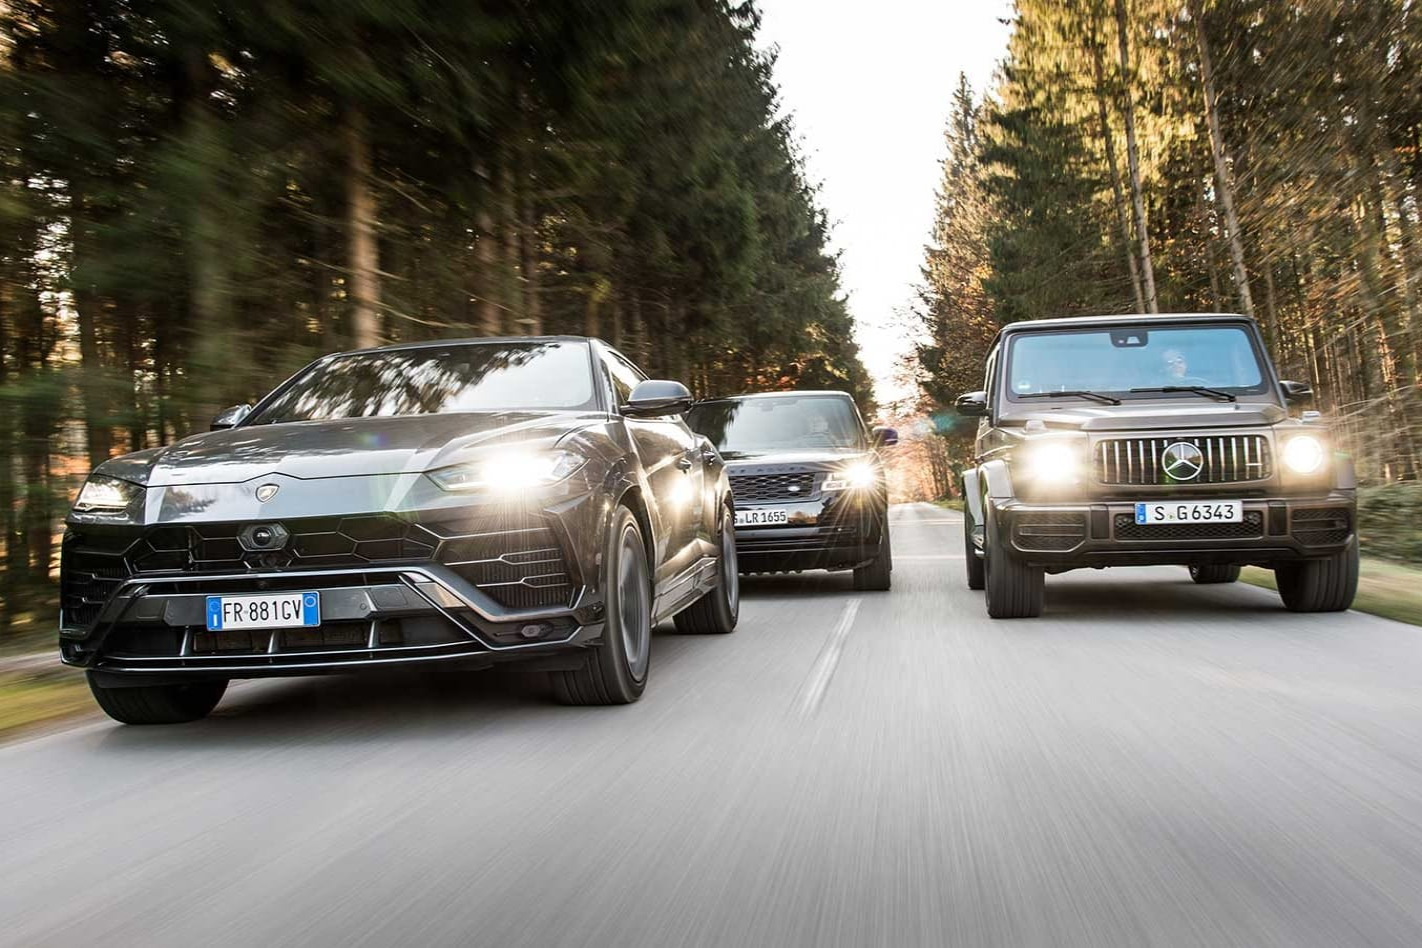 2019 Lamborghini Urus vs Mercedes-AMG G63 vs Range Rover performance comparison review